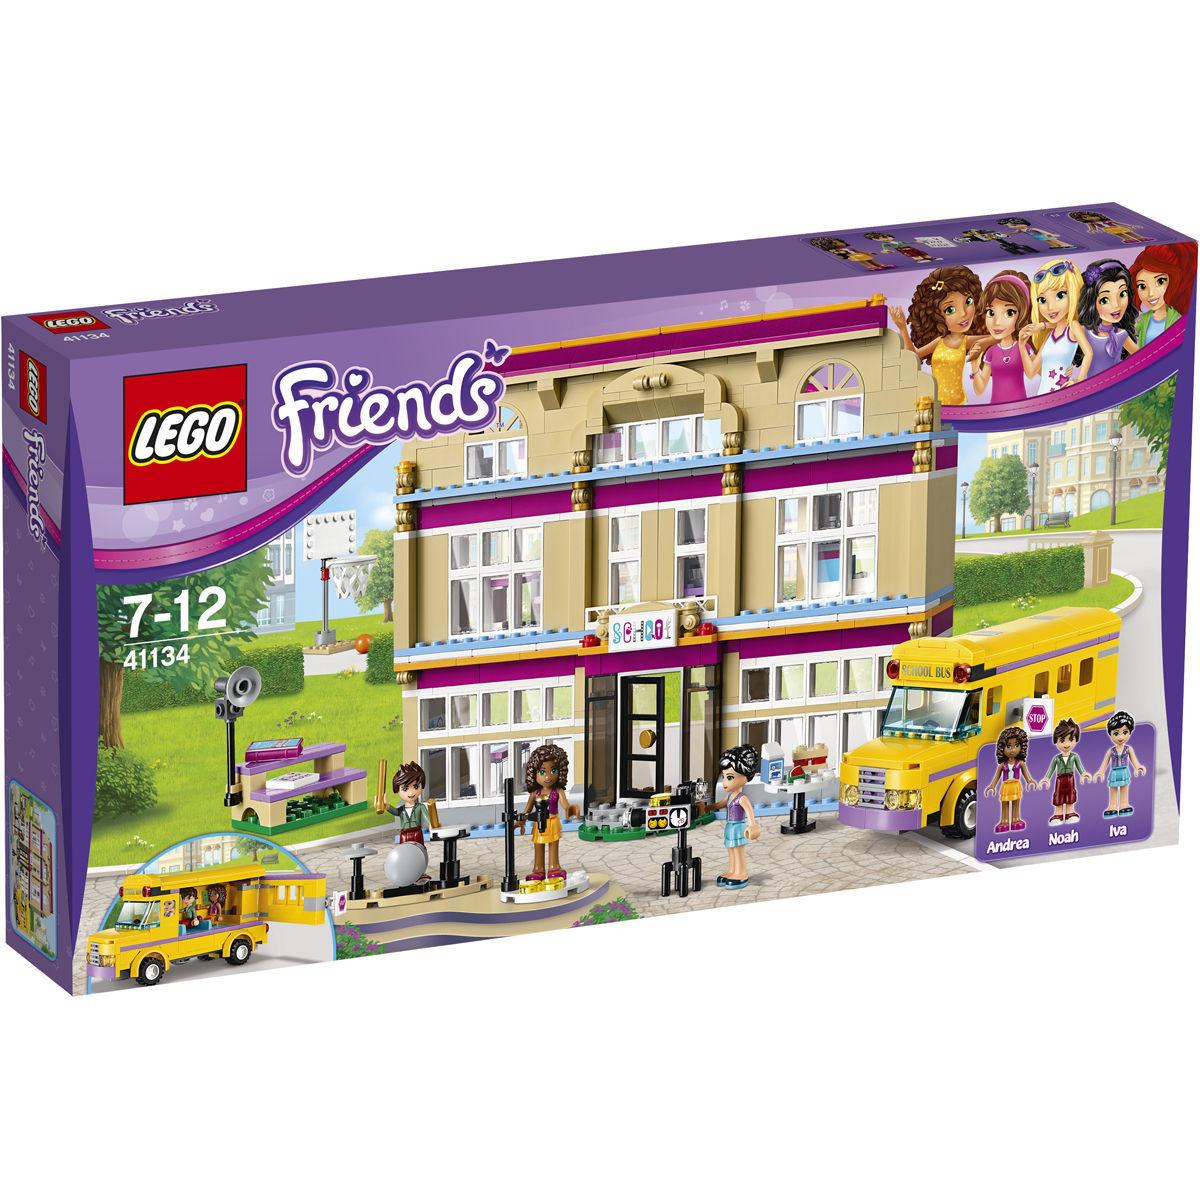 [Karstadt] Lego Friends 41134 Heartlake Kunstschule am Mo + Di für 49,99